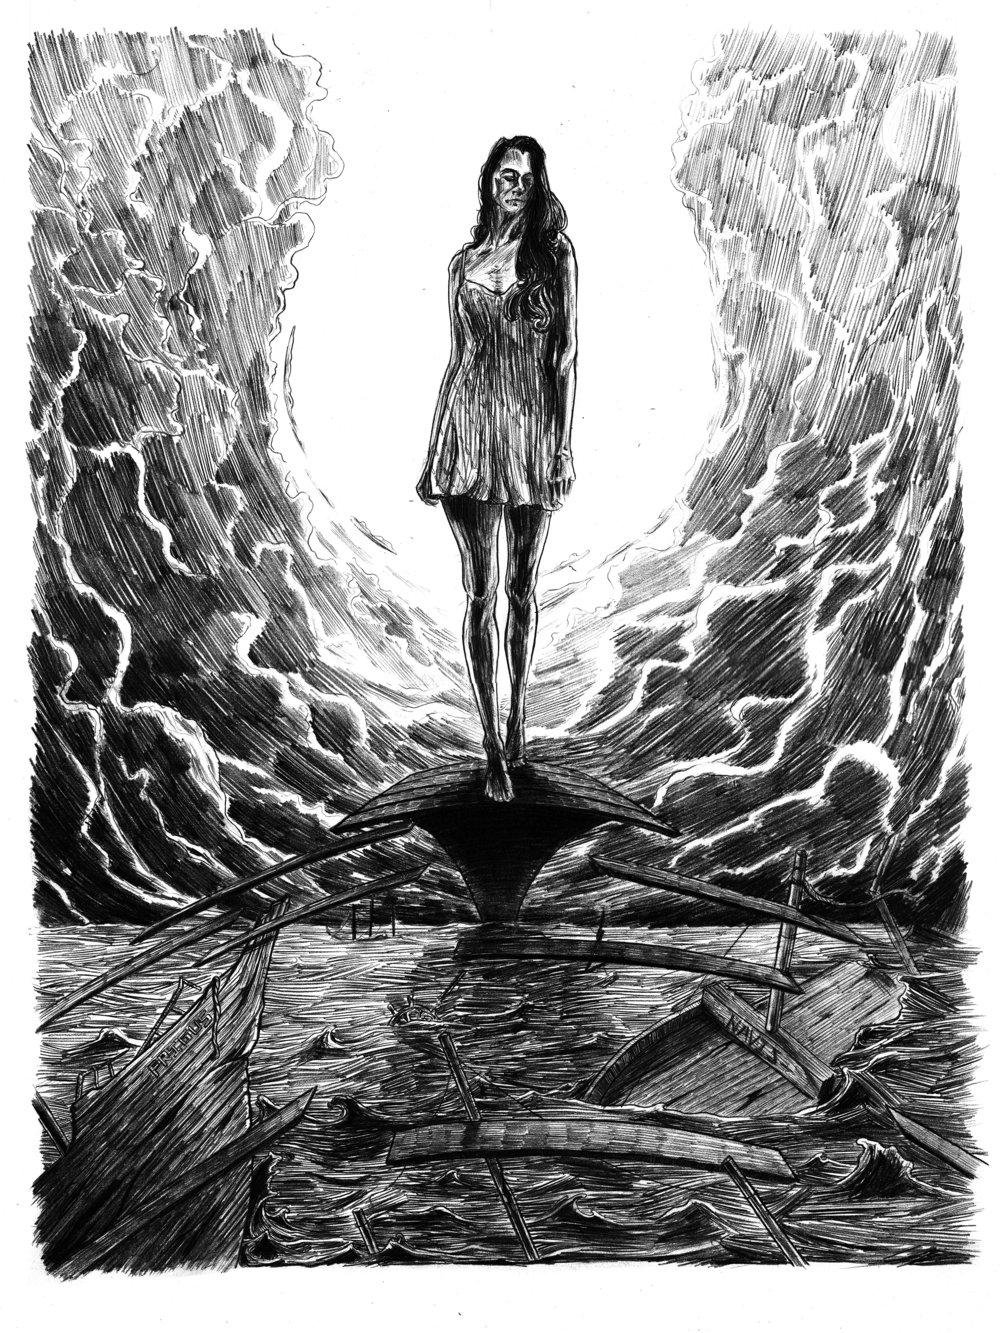 Final Drawing/ Label Illustration